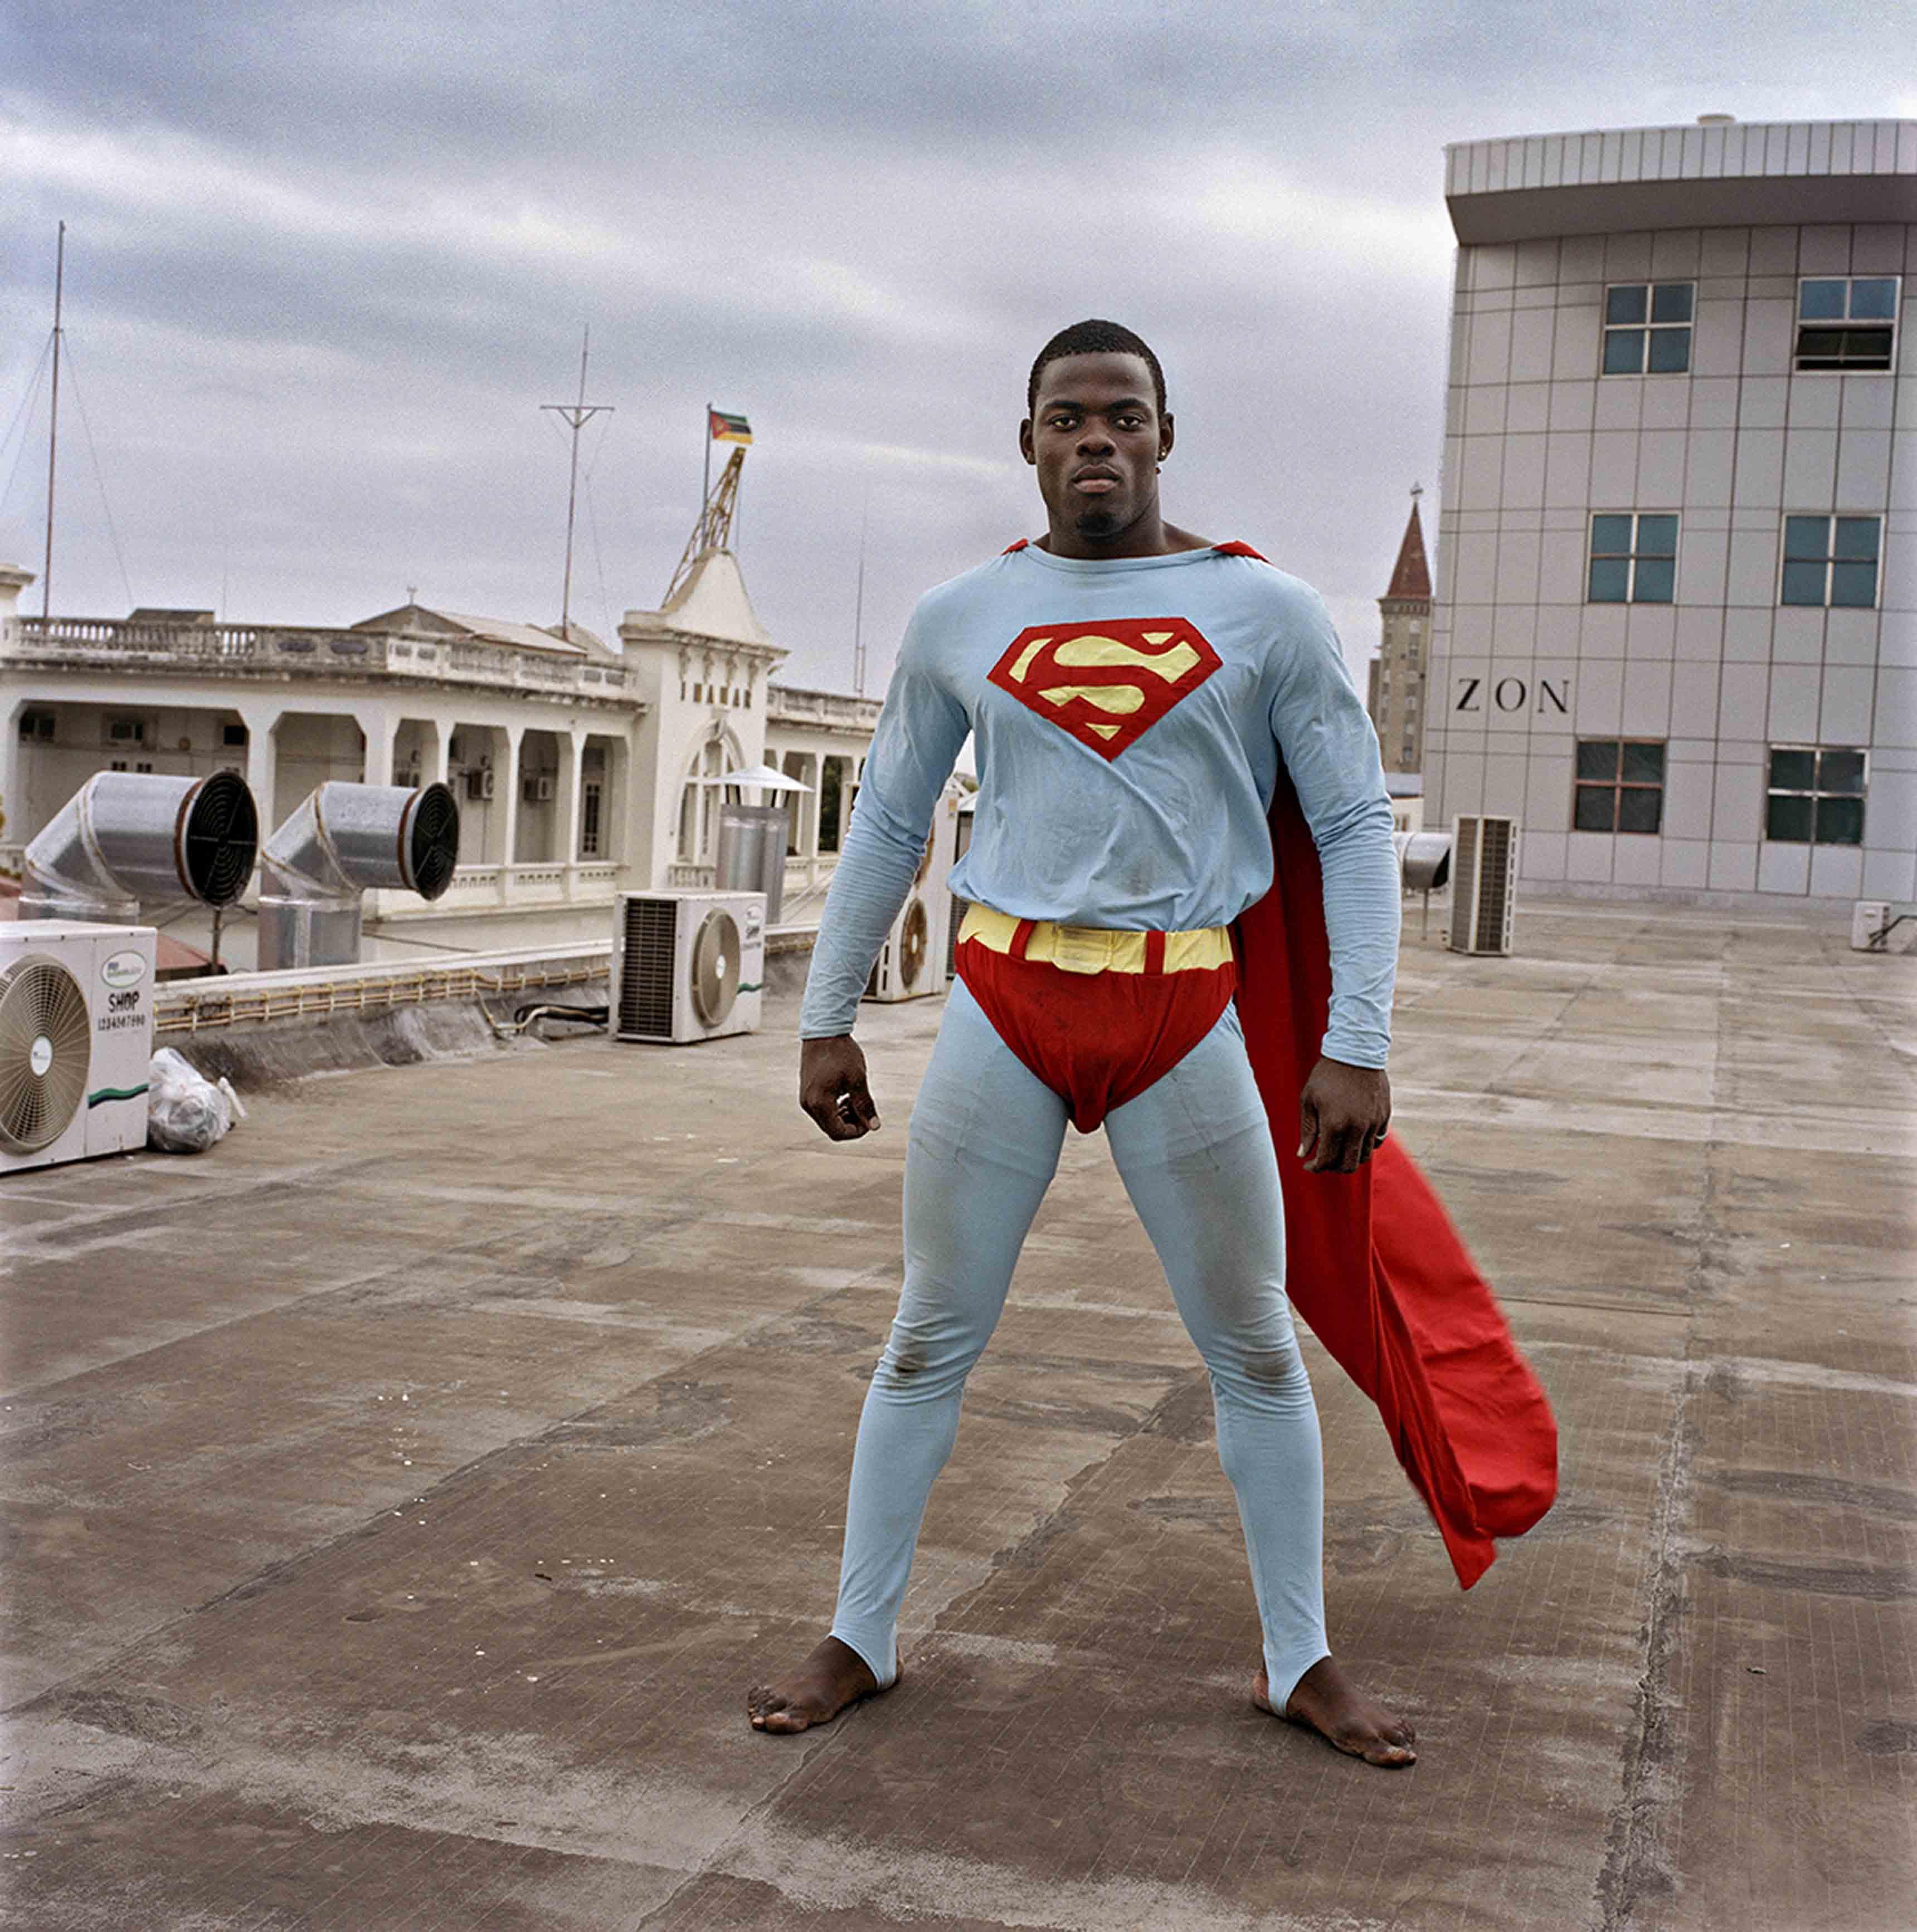 © Ditte Haarløv Johnsen, Maputo Diary, Superman on the roof of the new shopping mall, 2009.